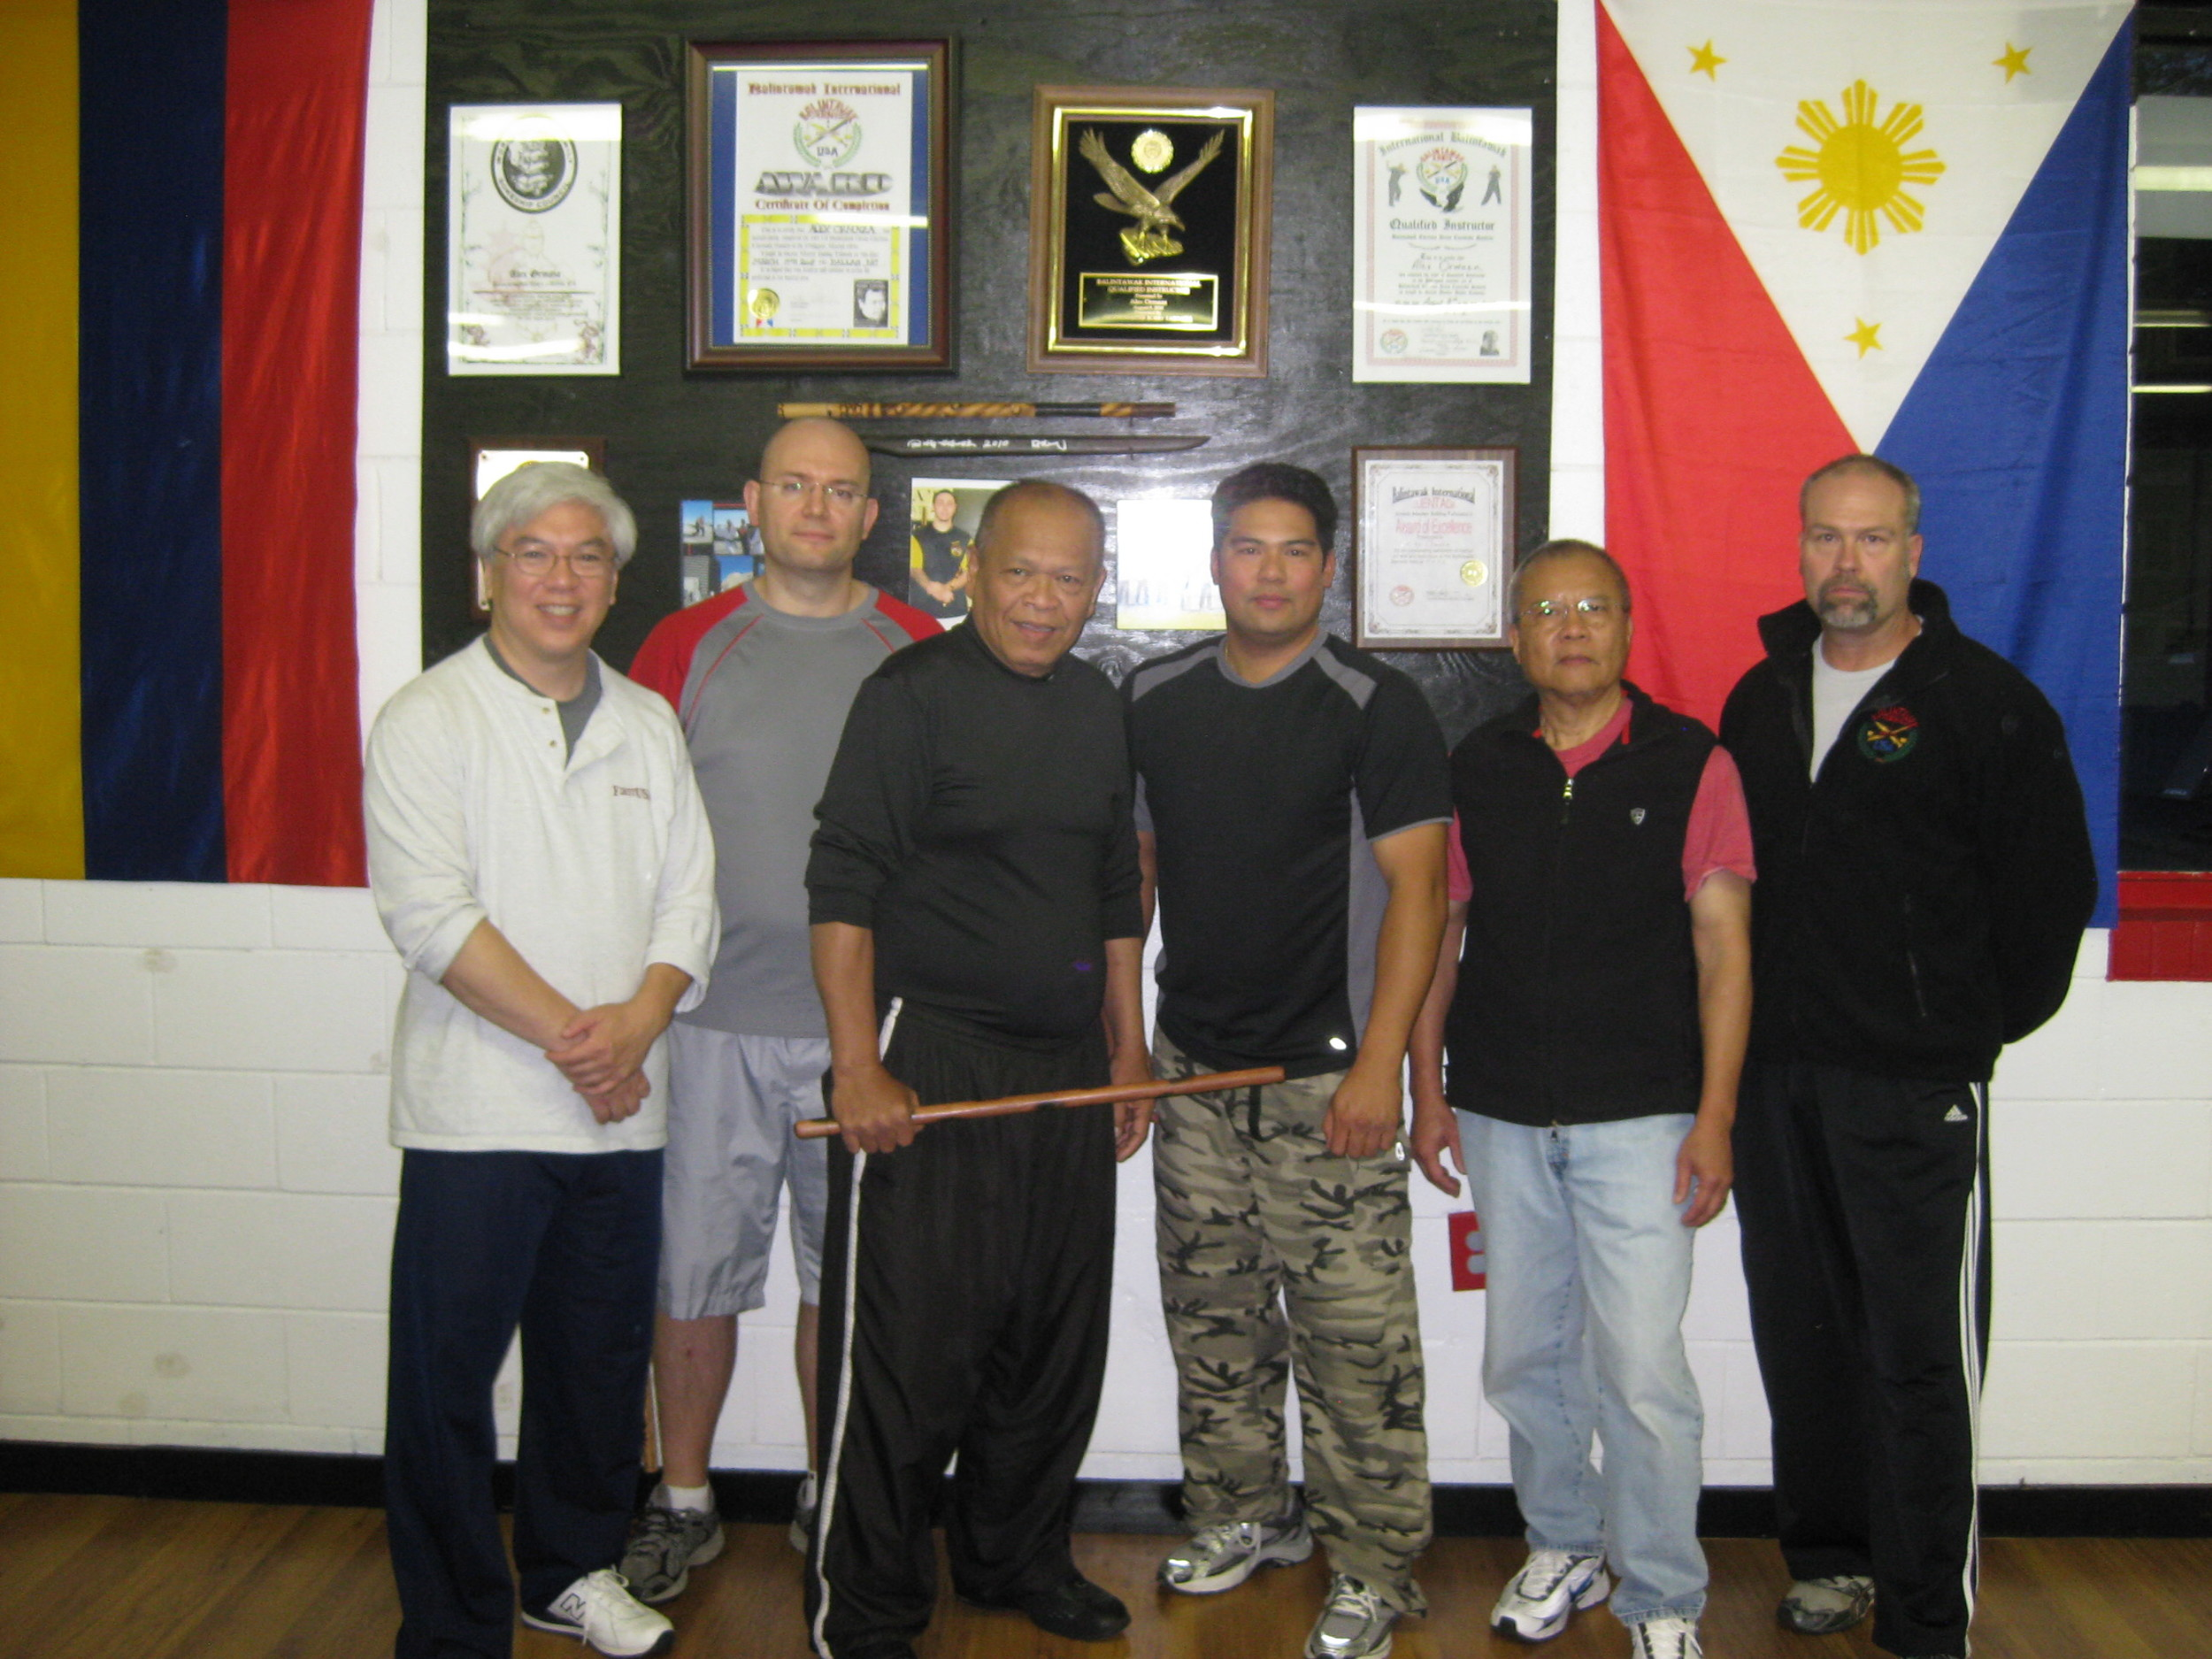 World Camp 2011. (L-R) Terence Chu, Pete Vatev, GM Bobby Taboada, Nebrido Nocon, Aris Taloma, Scott Meyer